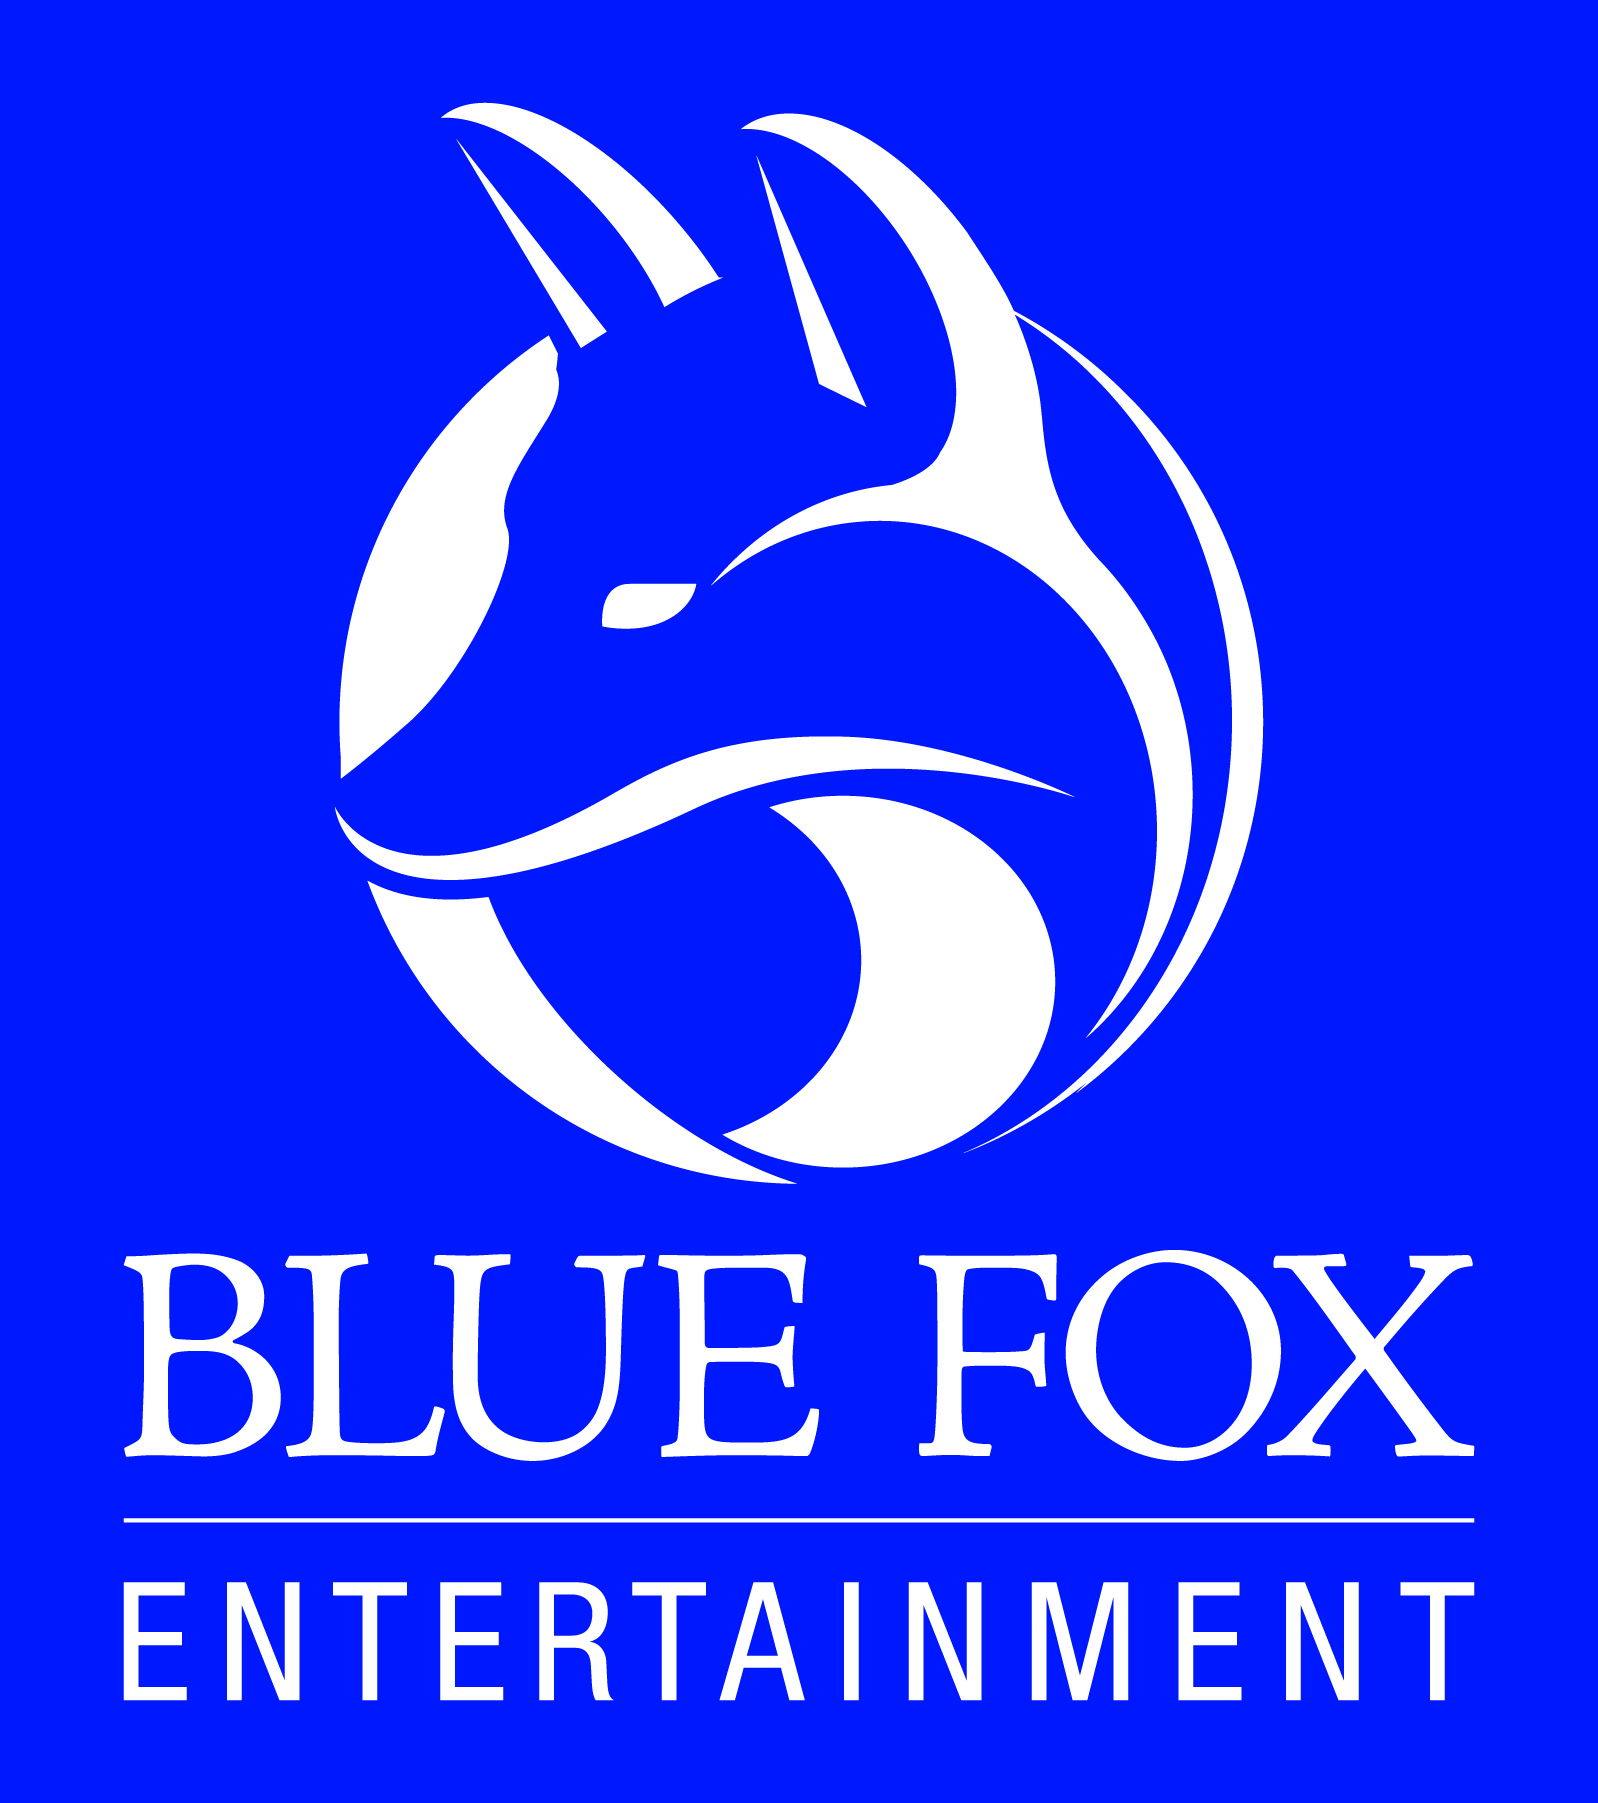 Blue Fox Entertainment